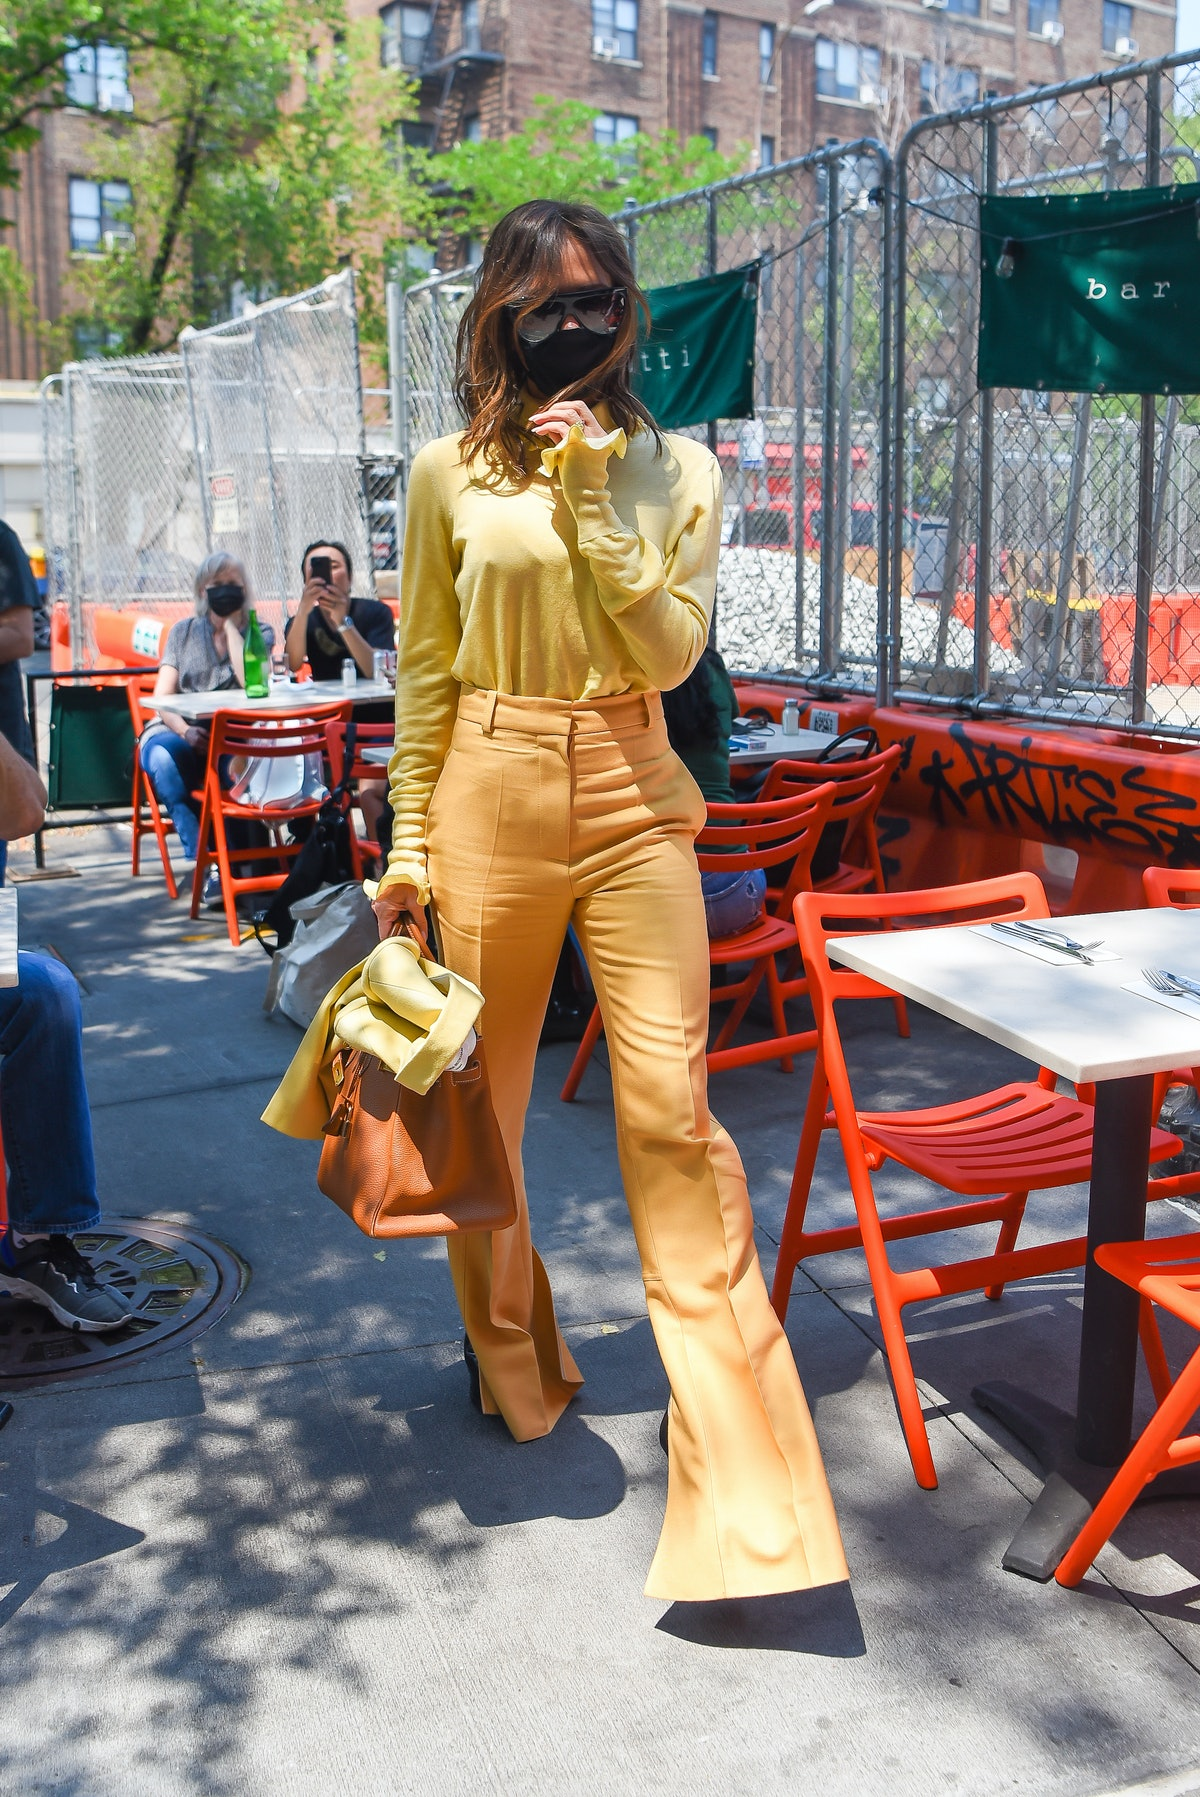 Victoria Beckham wearing all yellow